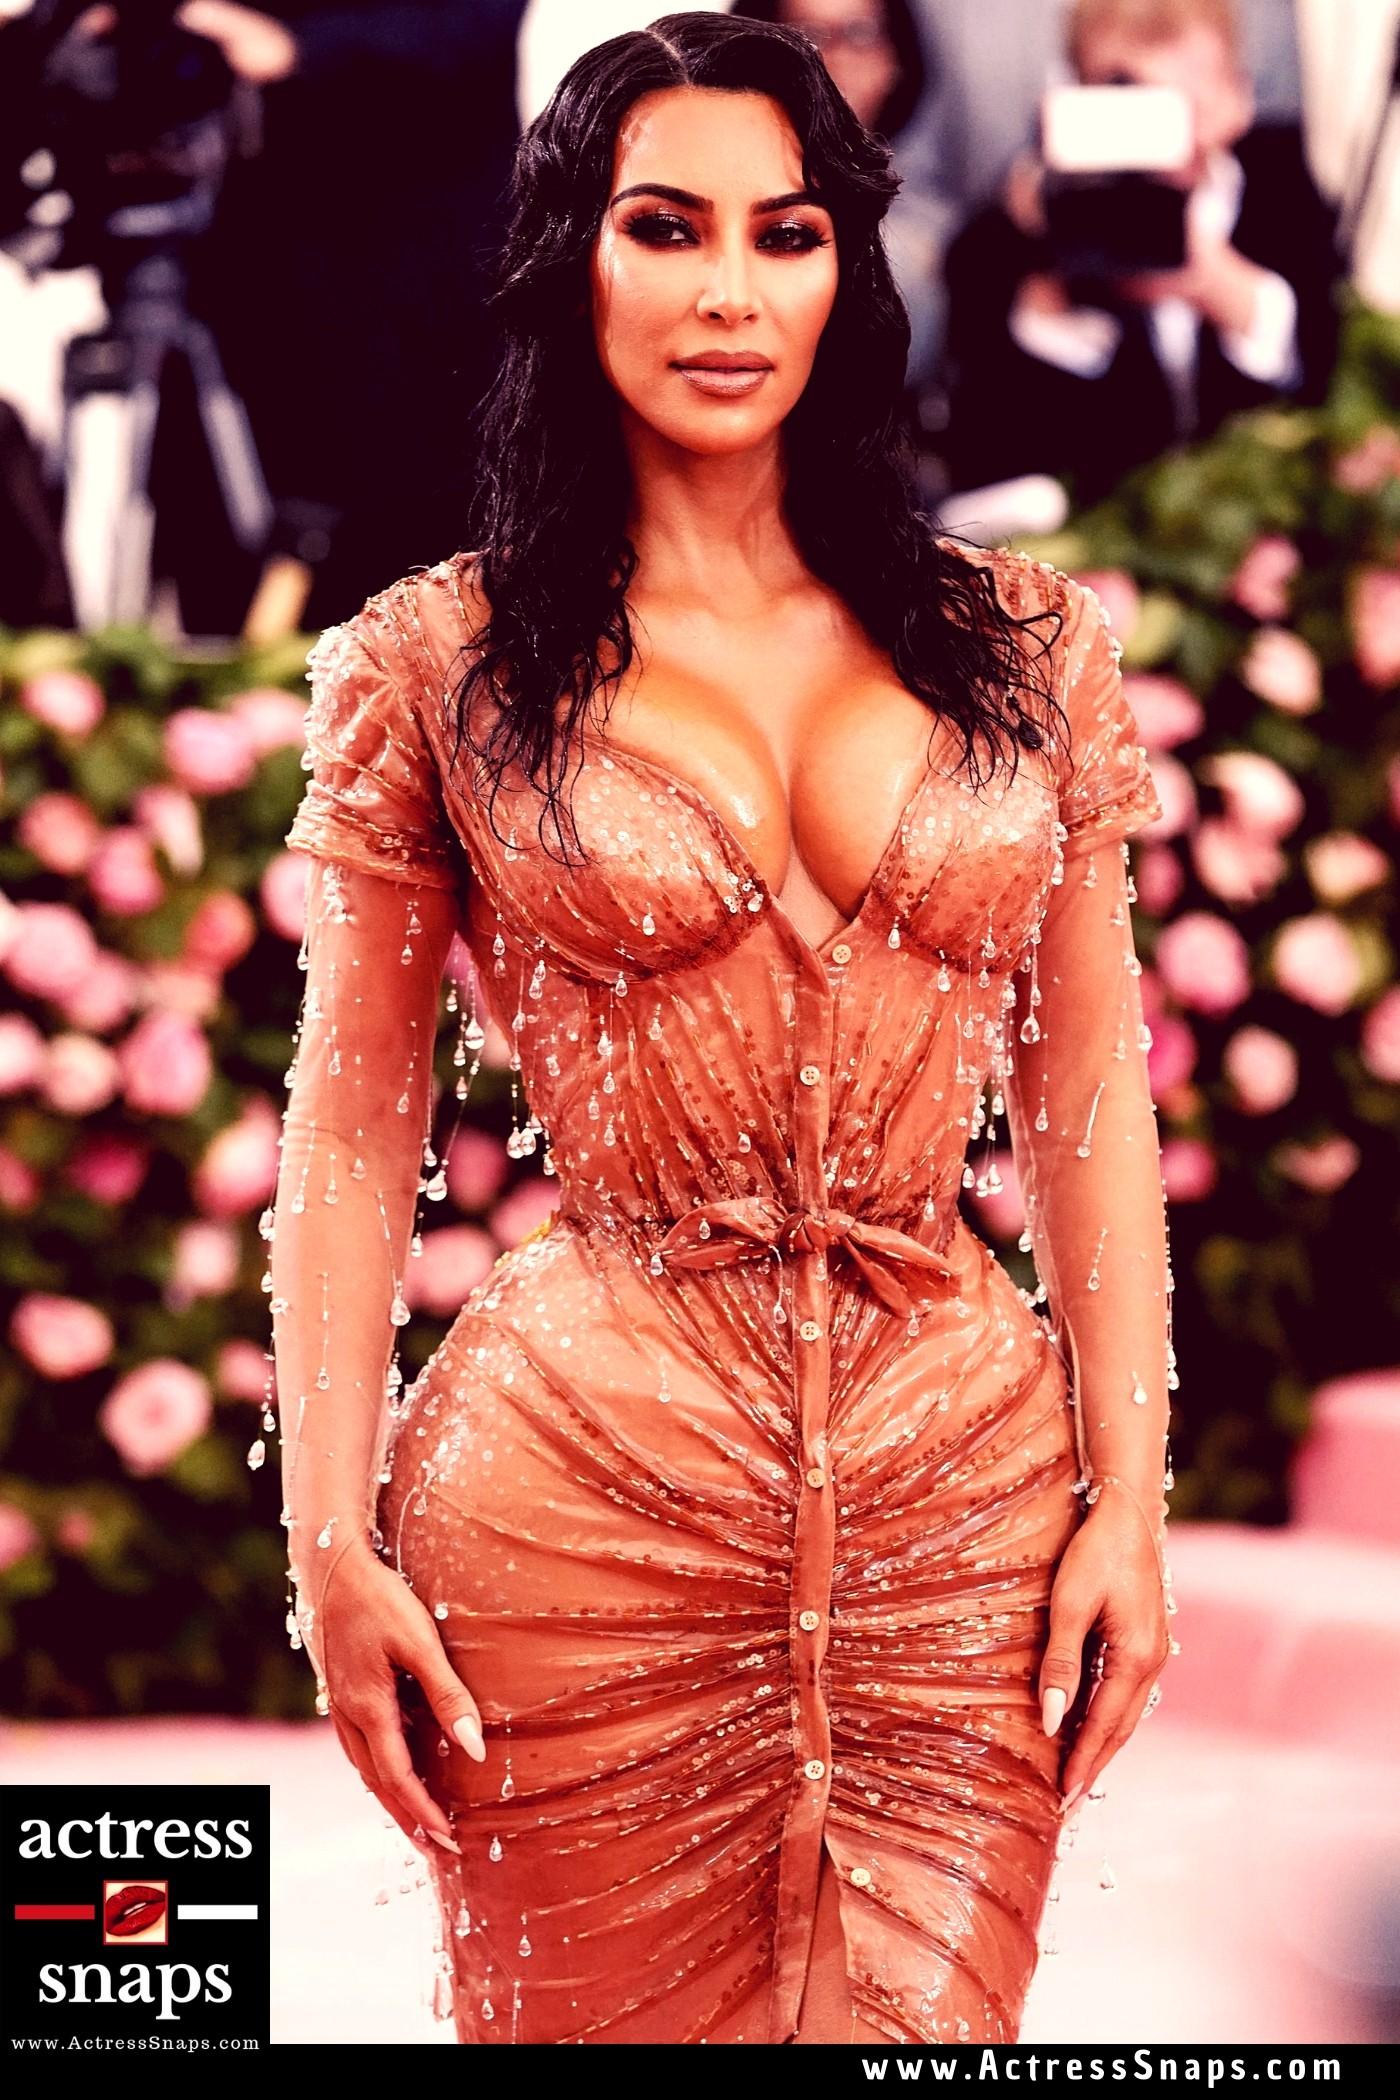 Sexy Kim Kardashian at Met Gala 2019 - Sexy Actress Pictures | Hot Actress Pictures - ActressSnaps.com